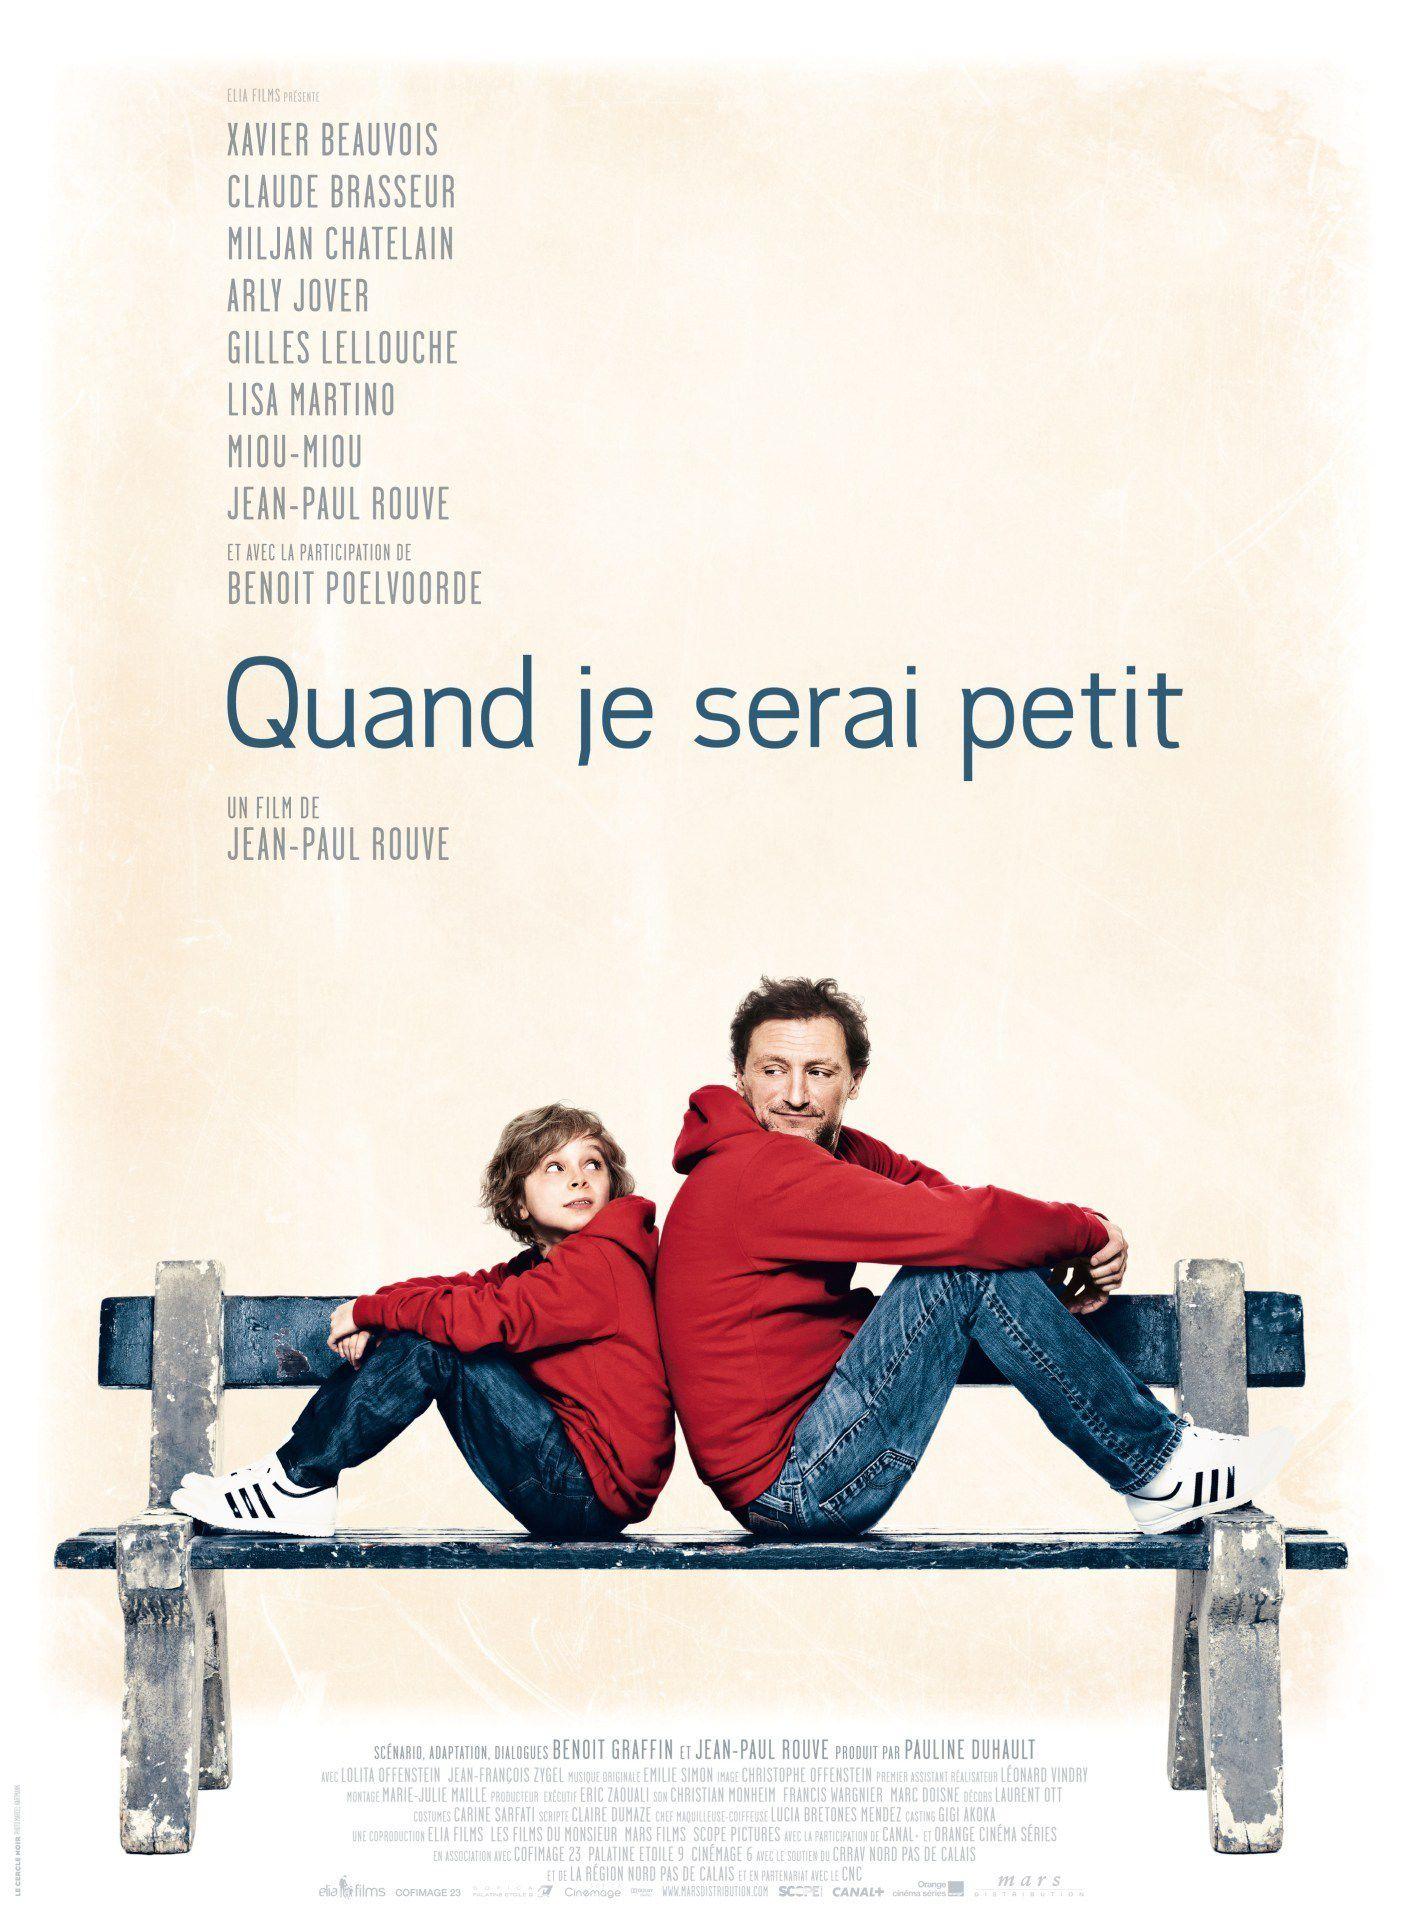 Quand je serai petit - Film (2012)